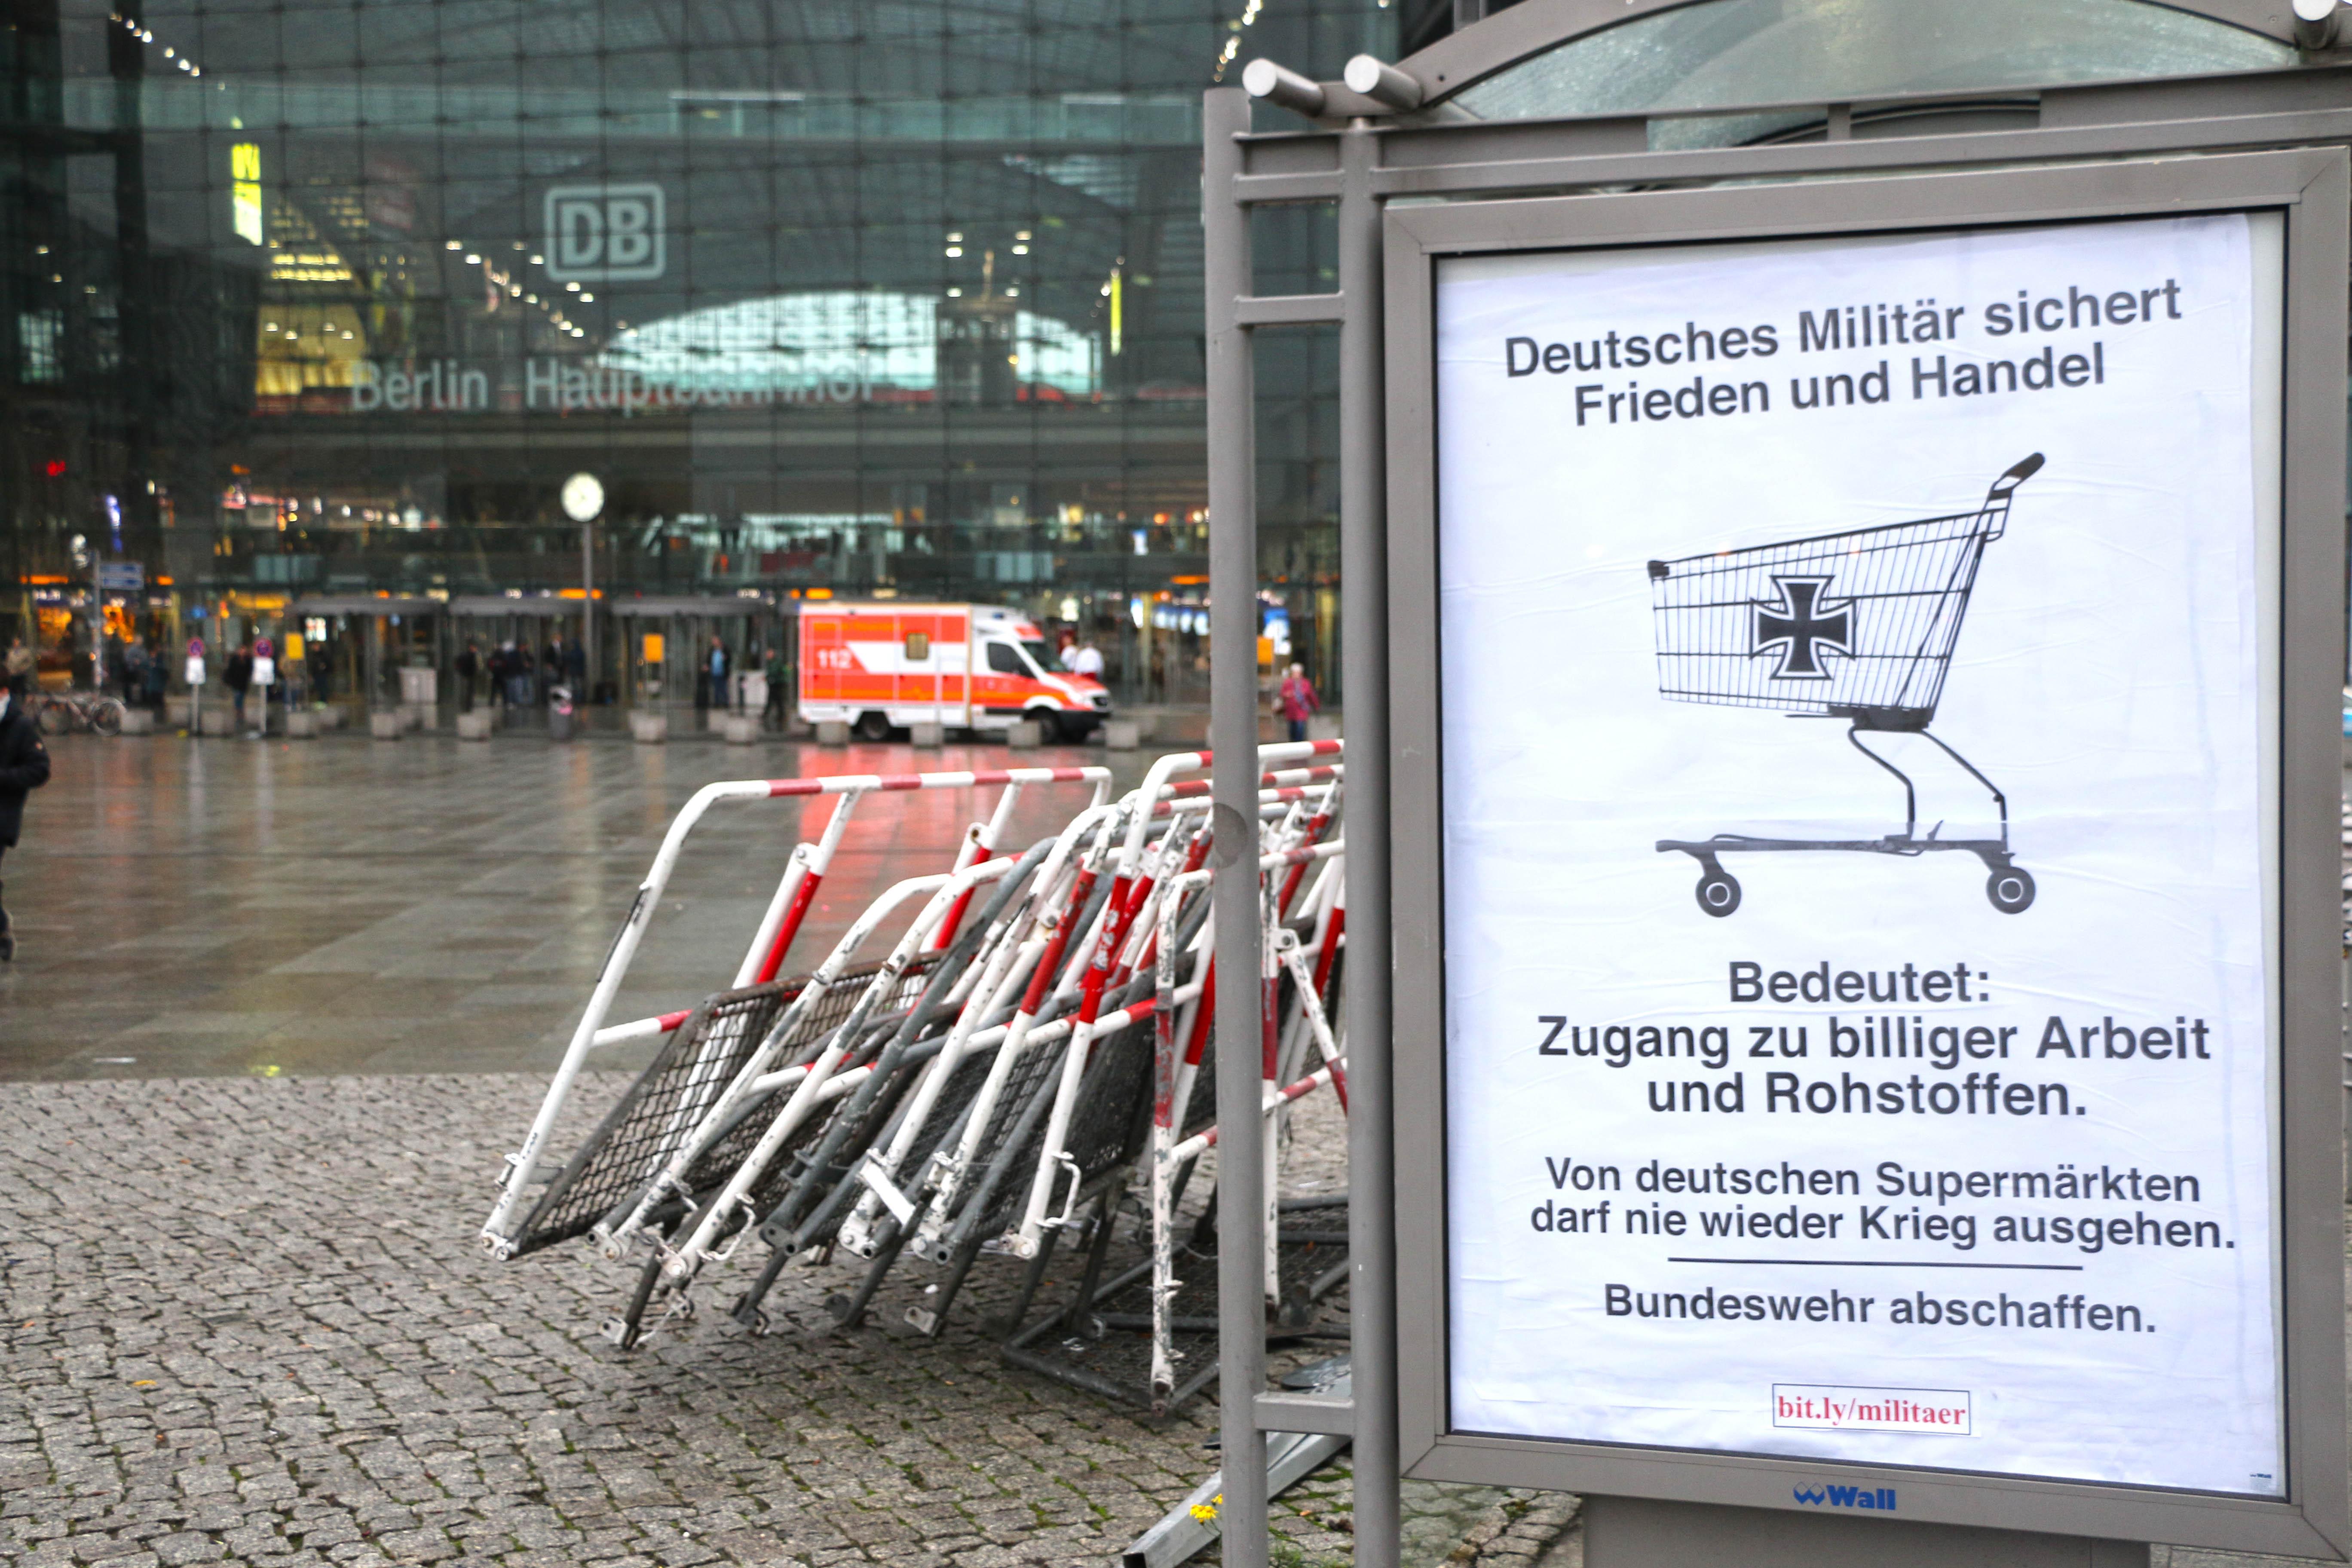 Bundeswehr-Adbusting am Berliner Hbf